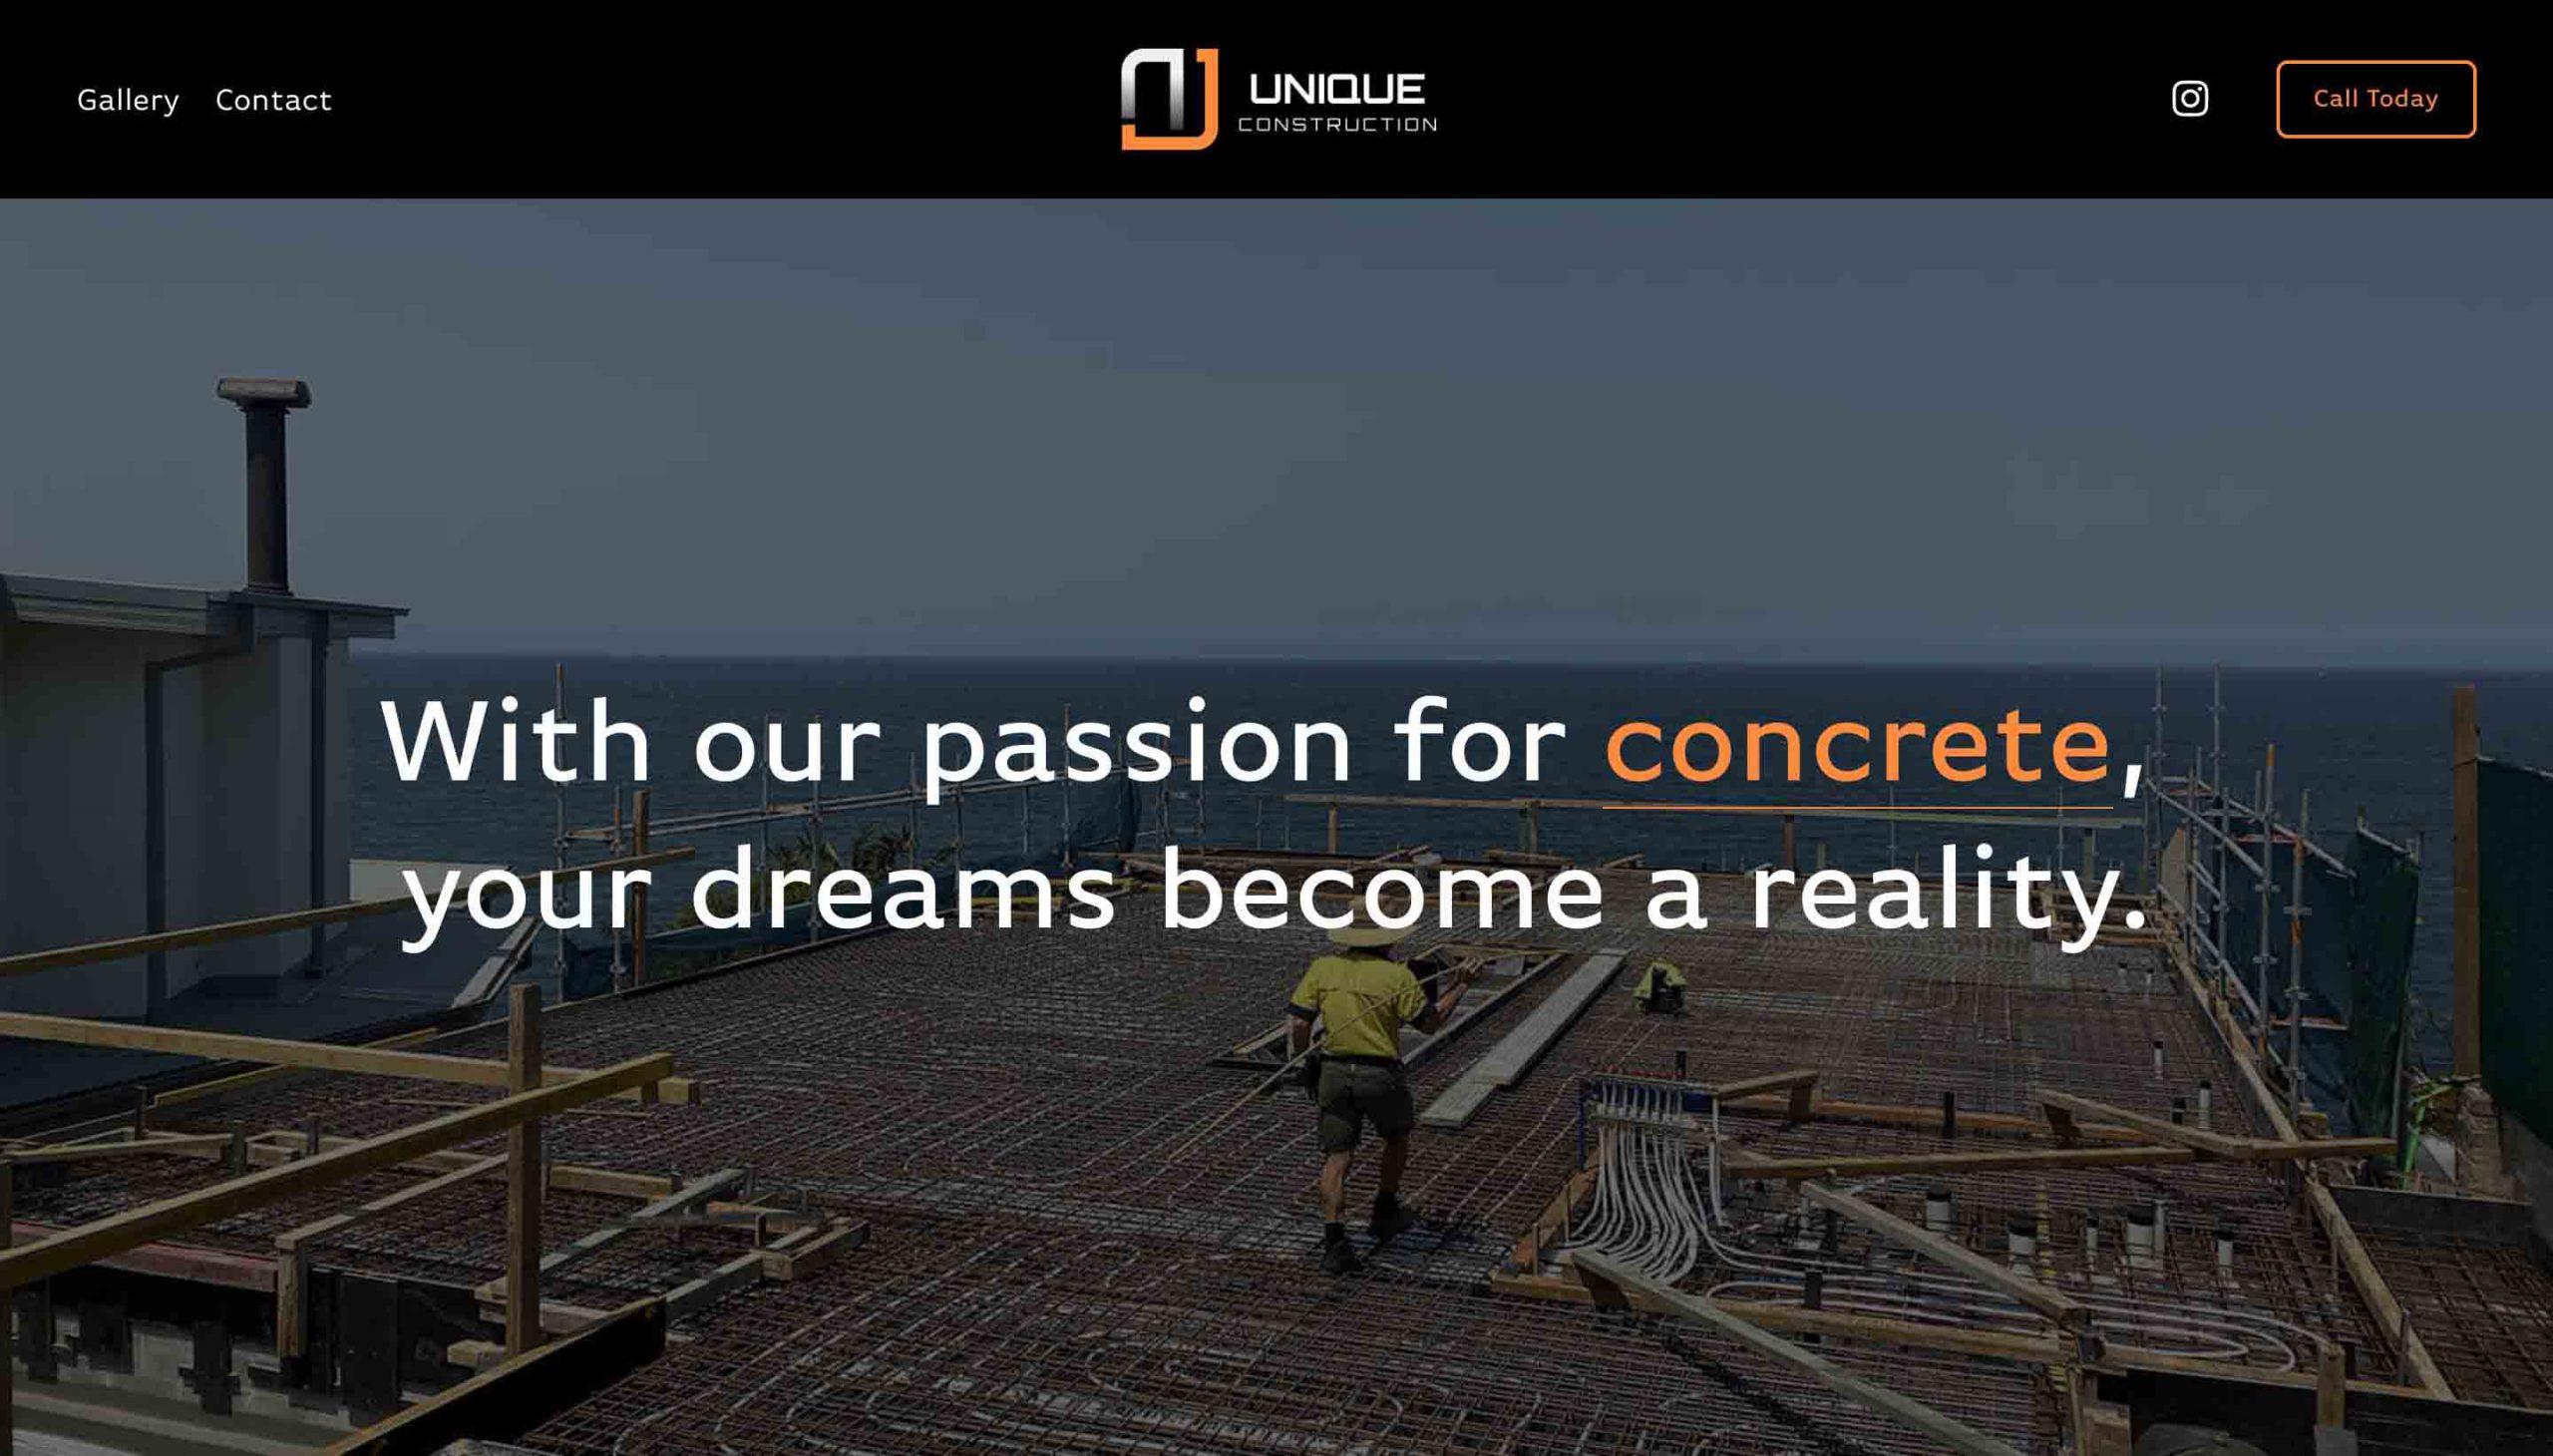 unique construction screen shot scaled